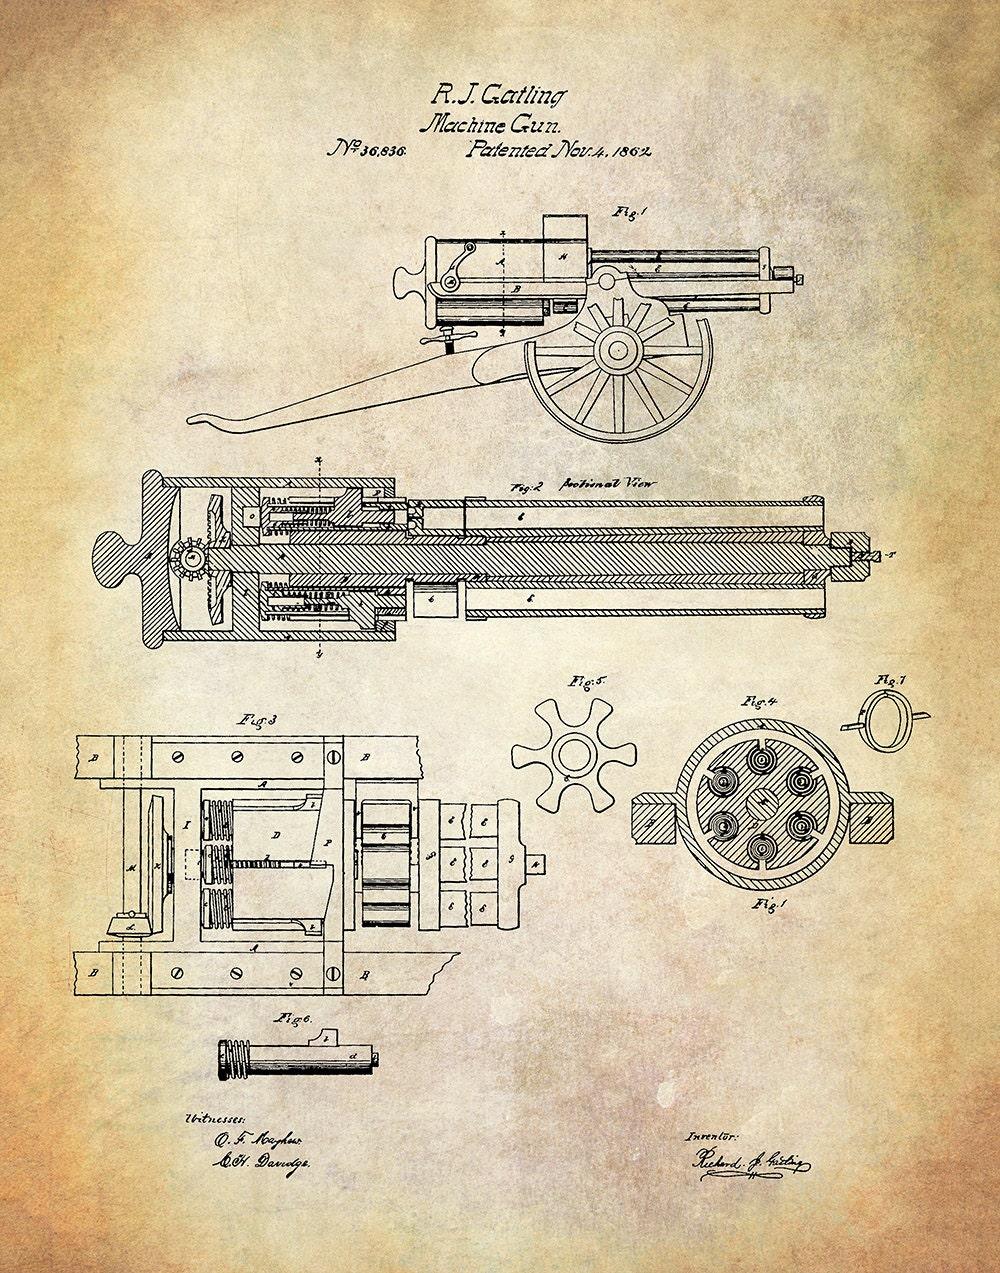 Vintage Machine Gun Patent Art Print - Gatling Patent Print